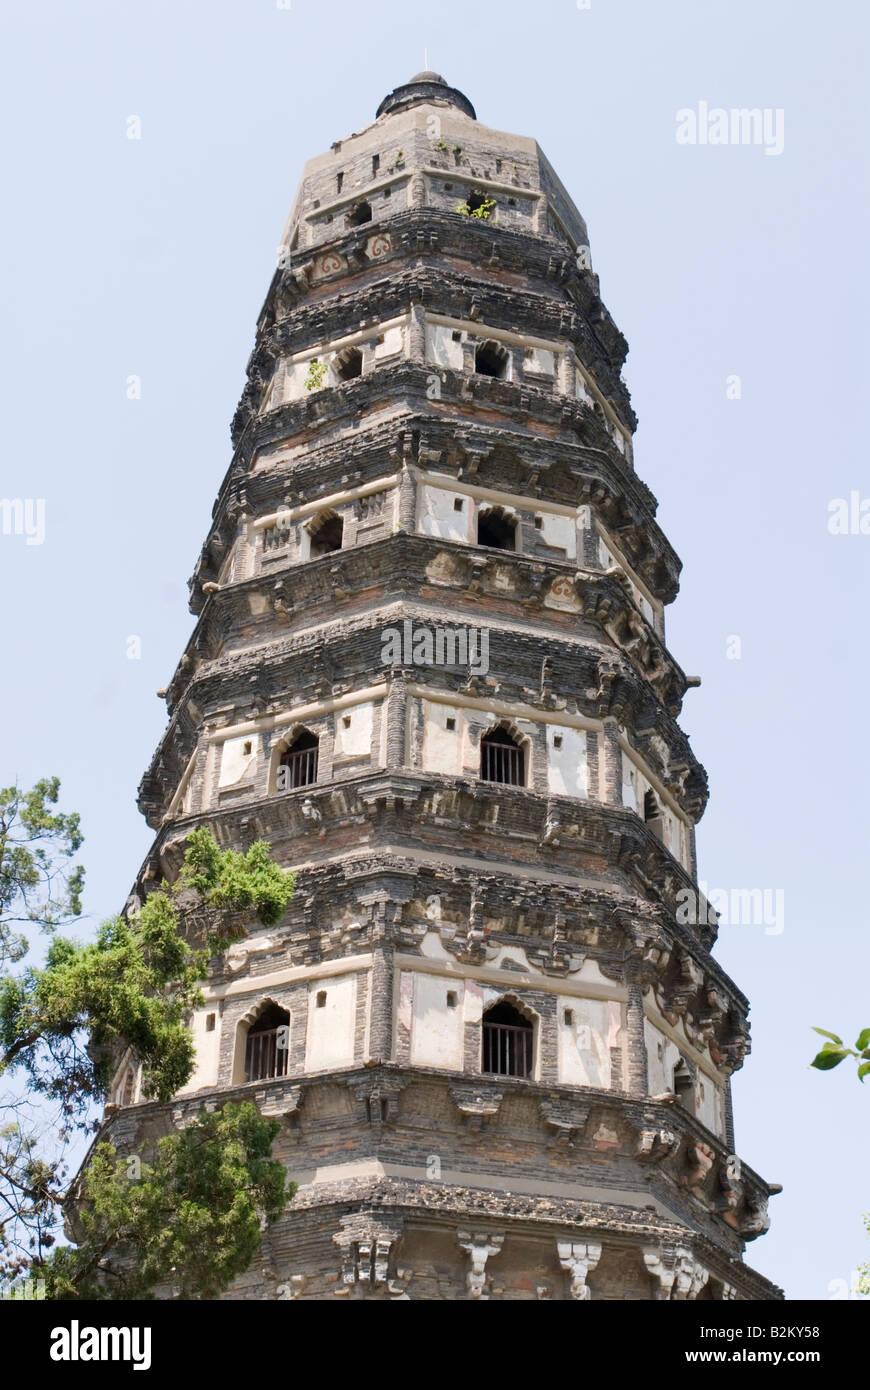 China, Suzhou Yunyan Pagoda, la Colina del Tigre Imagen De Stock